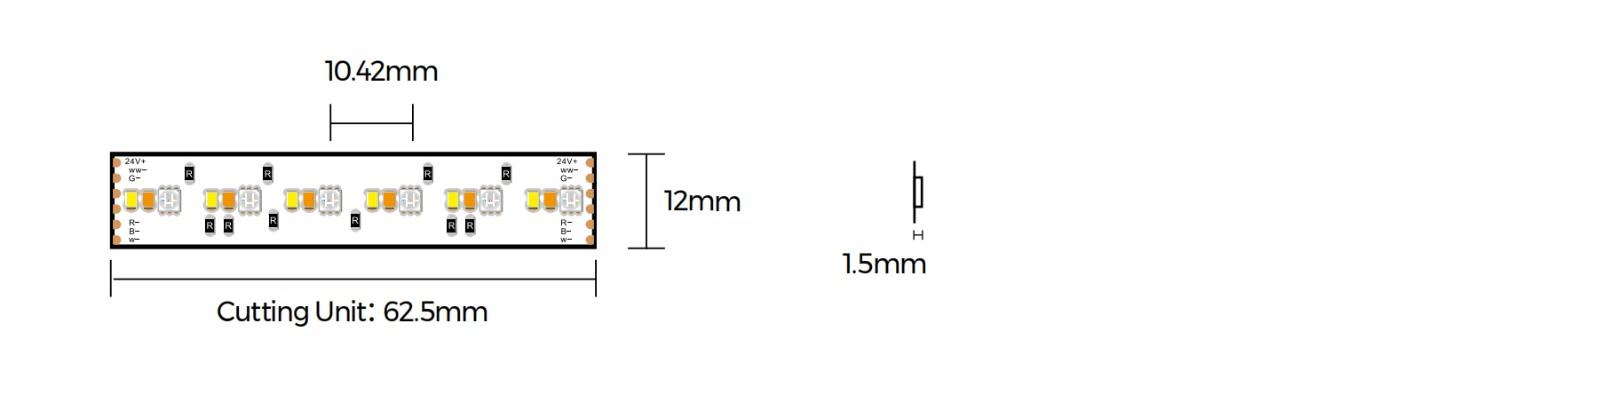 DA696RGBSWW-24V-12mm